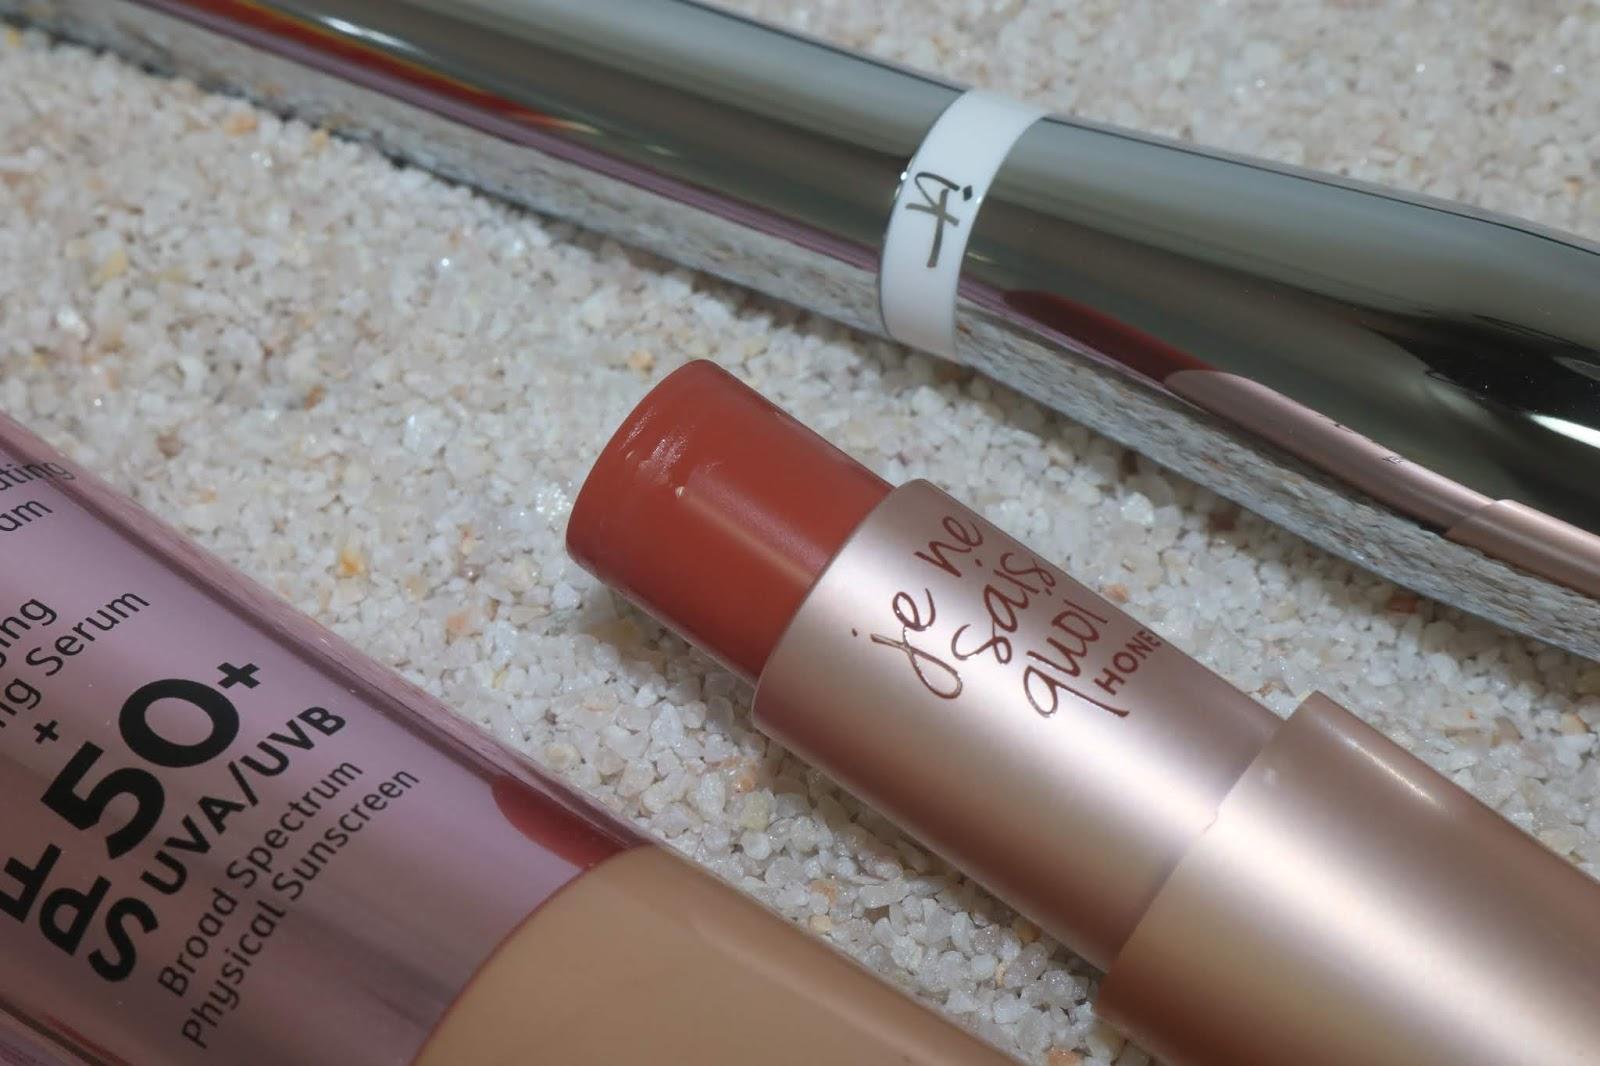 IT Cosmetics Je Ne Sais Quoi Hydrating Color Awakening Lip Treatment in Honey